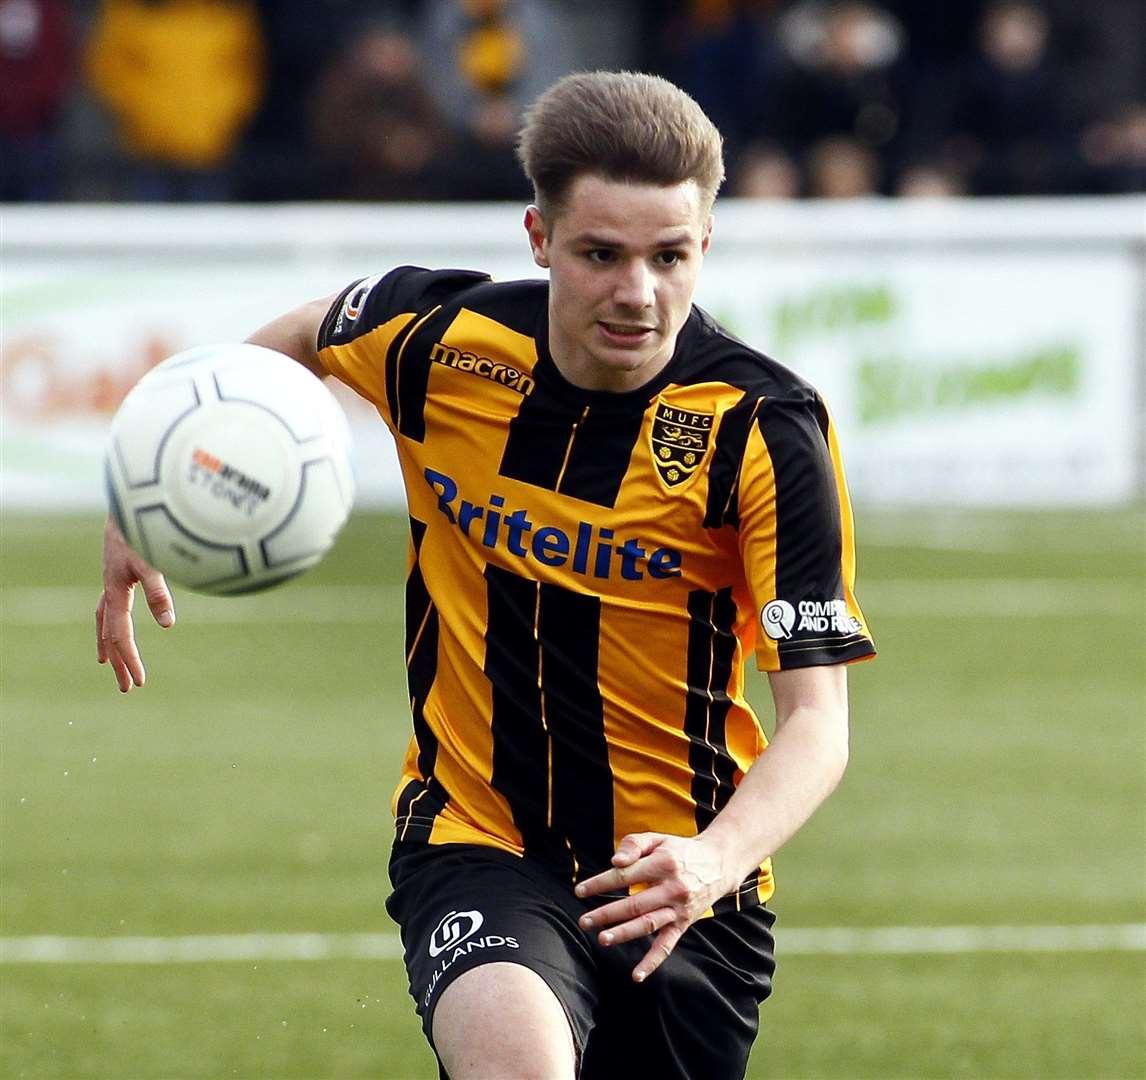 Jake Embery joined Margate from Maidstone Photo: Sean Aidan